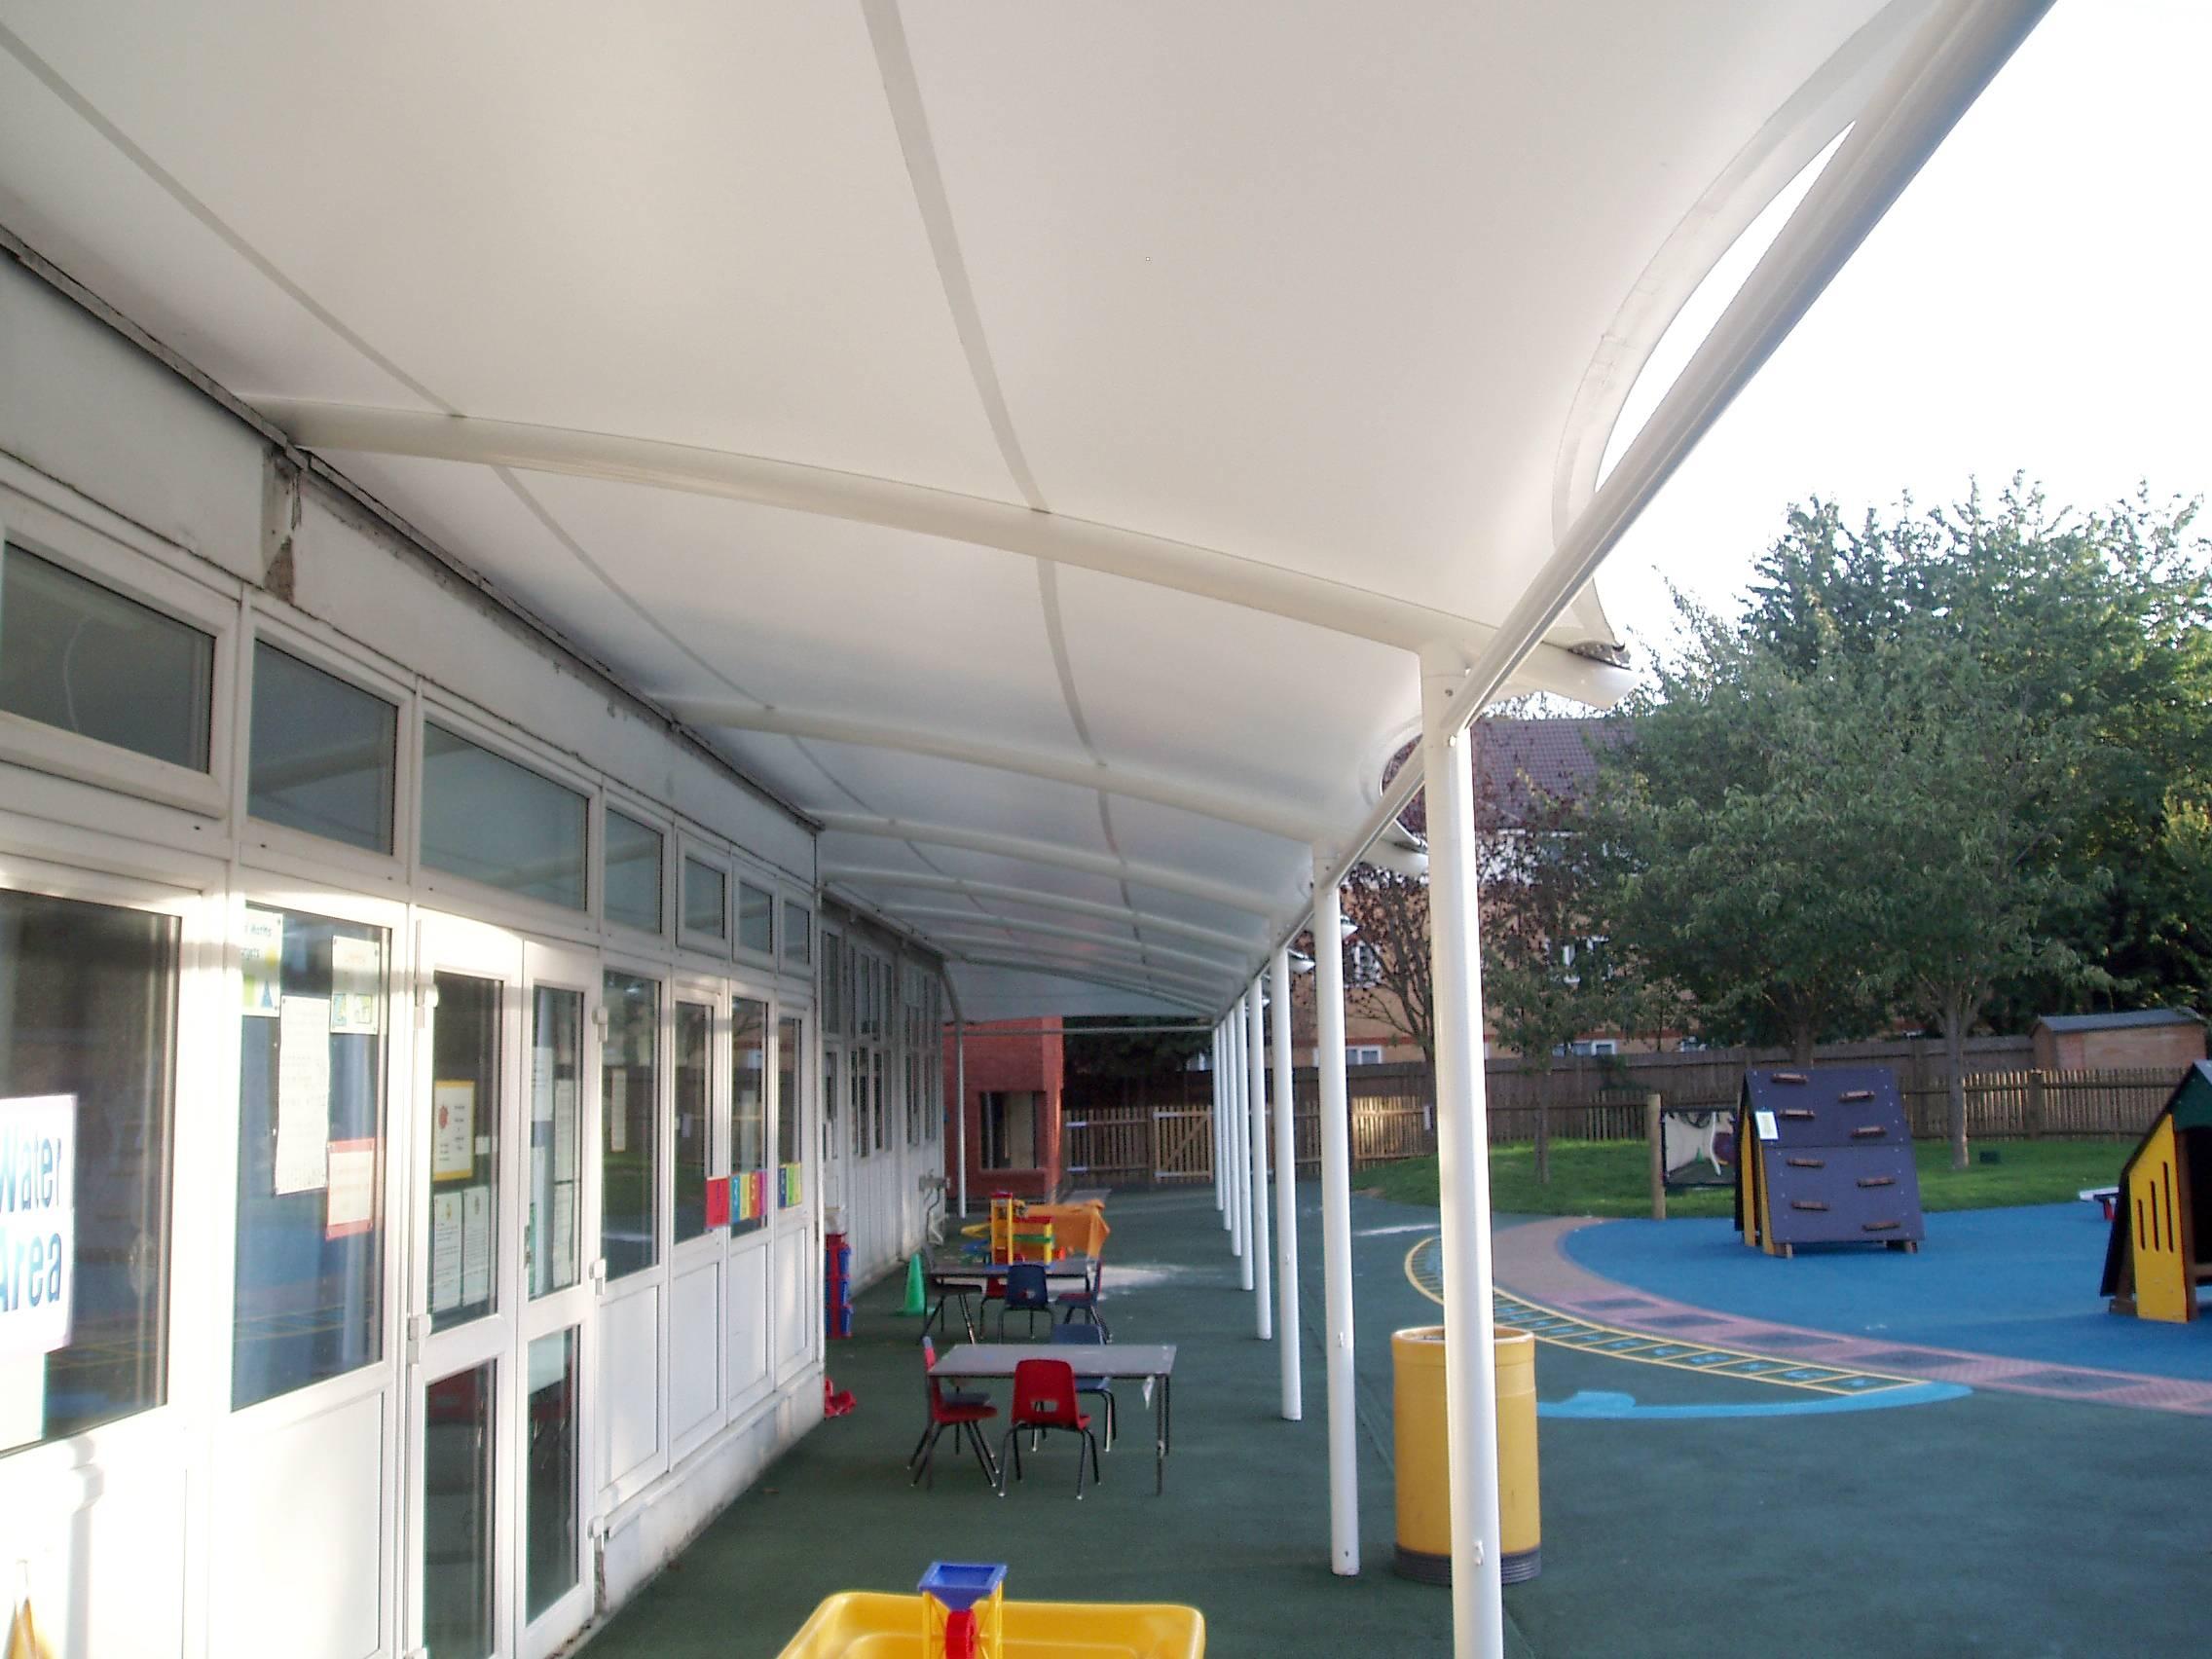 West Drayton School